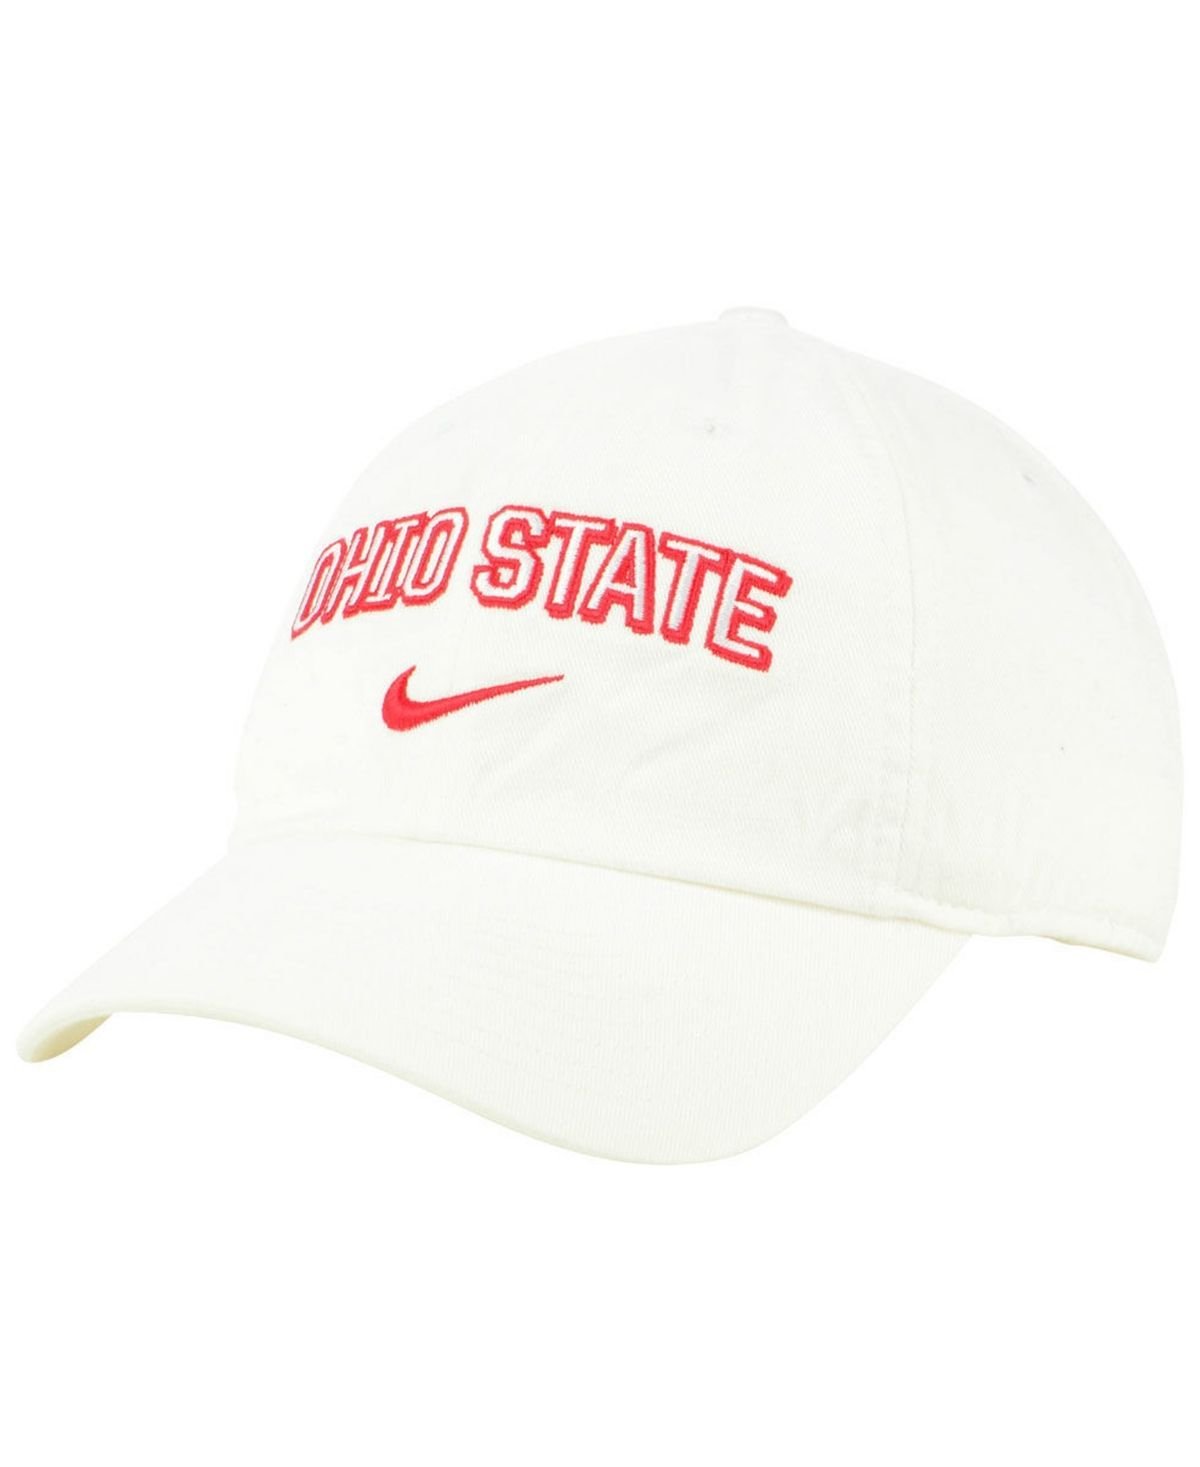 Ohio State Buckeyes H86 Wordmark Swoosh Cap #ohiostatebuckeyes Nike Ohio State Buckeyes H86 Wordmark Swoosh Cap - White #ohiostatebuckeyes